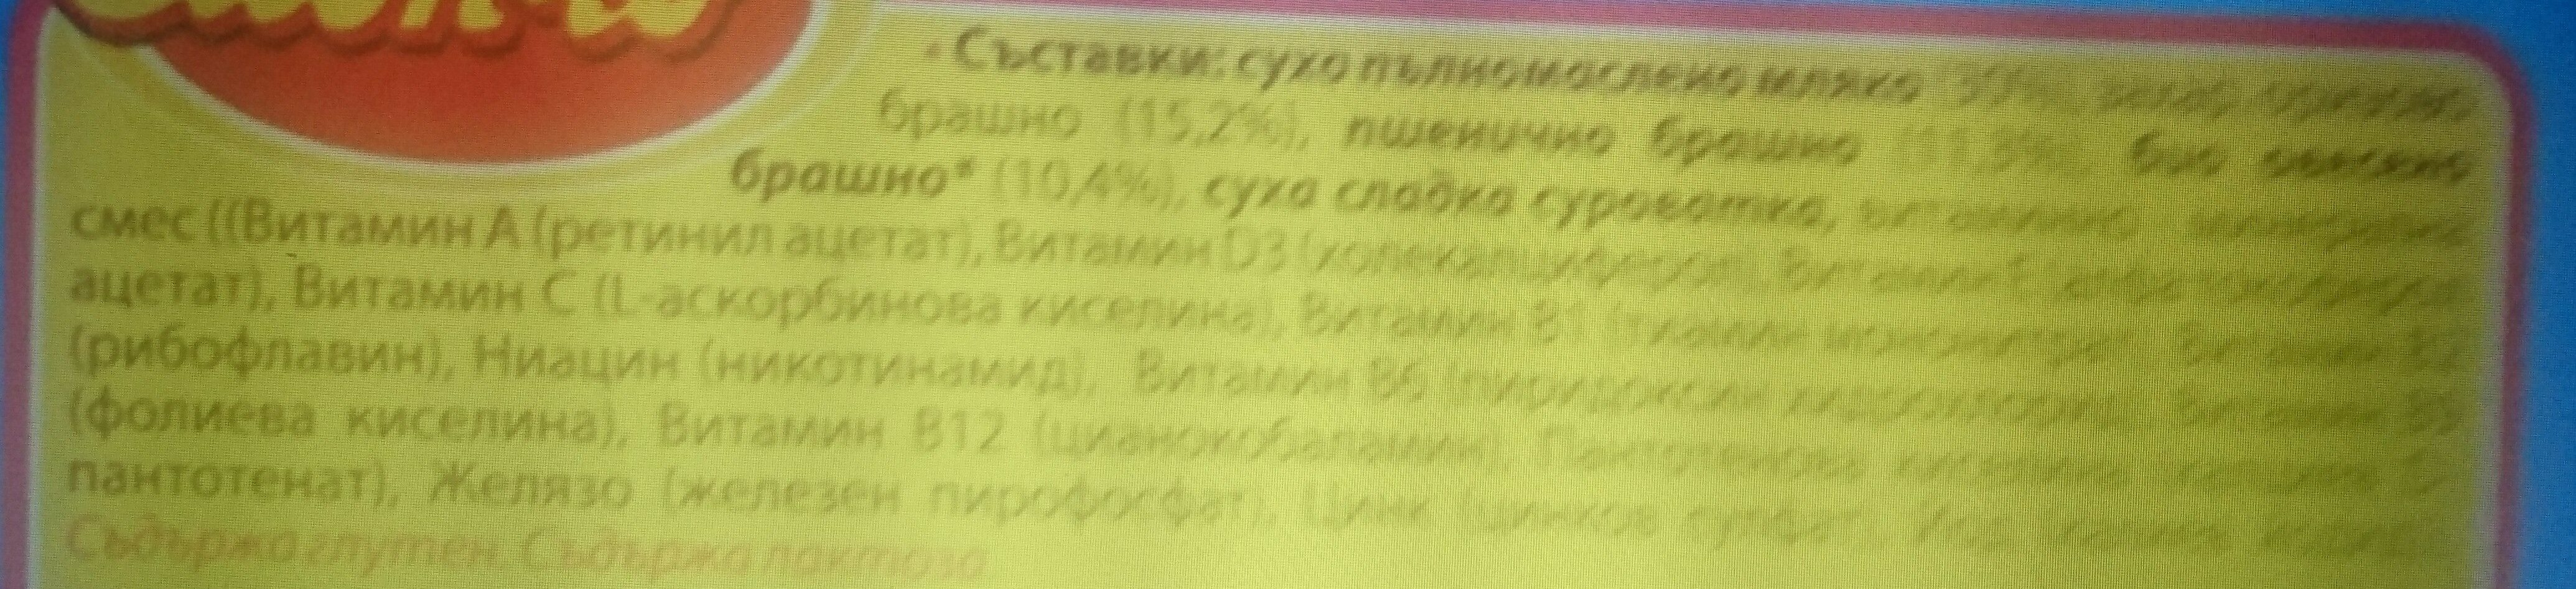 Слънчо зърнин М инстантна каша - Ingredients - en